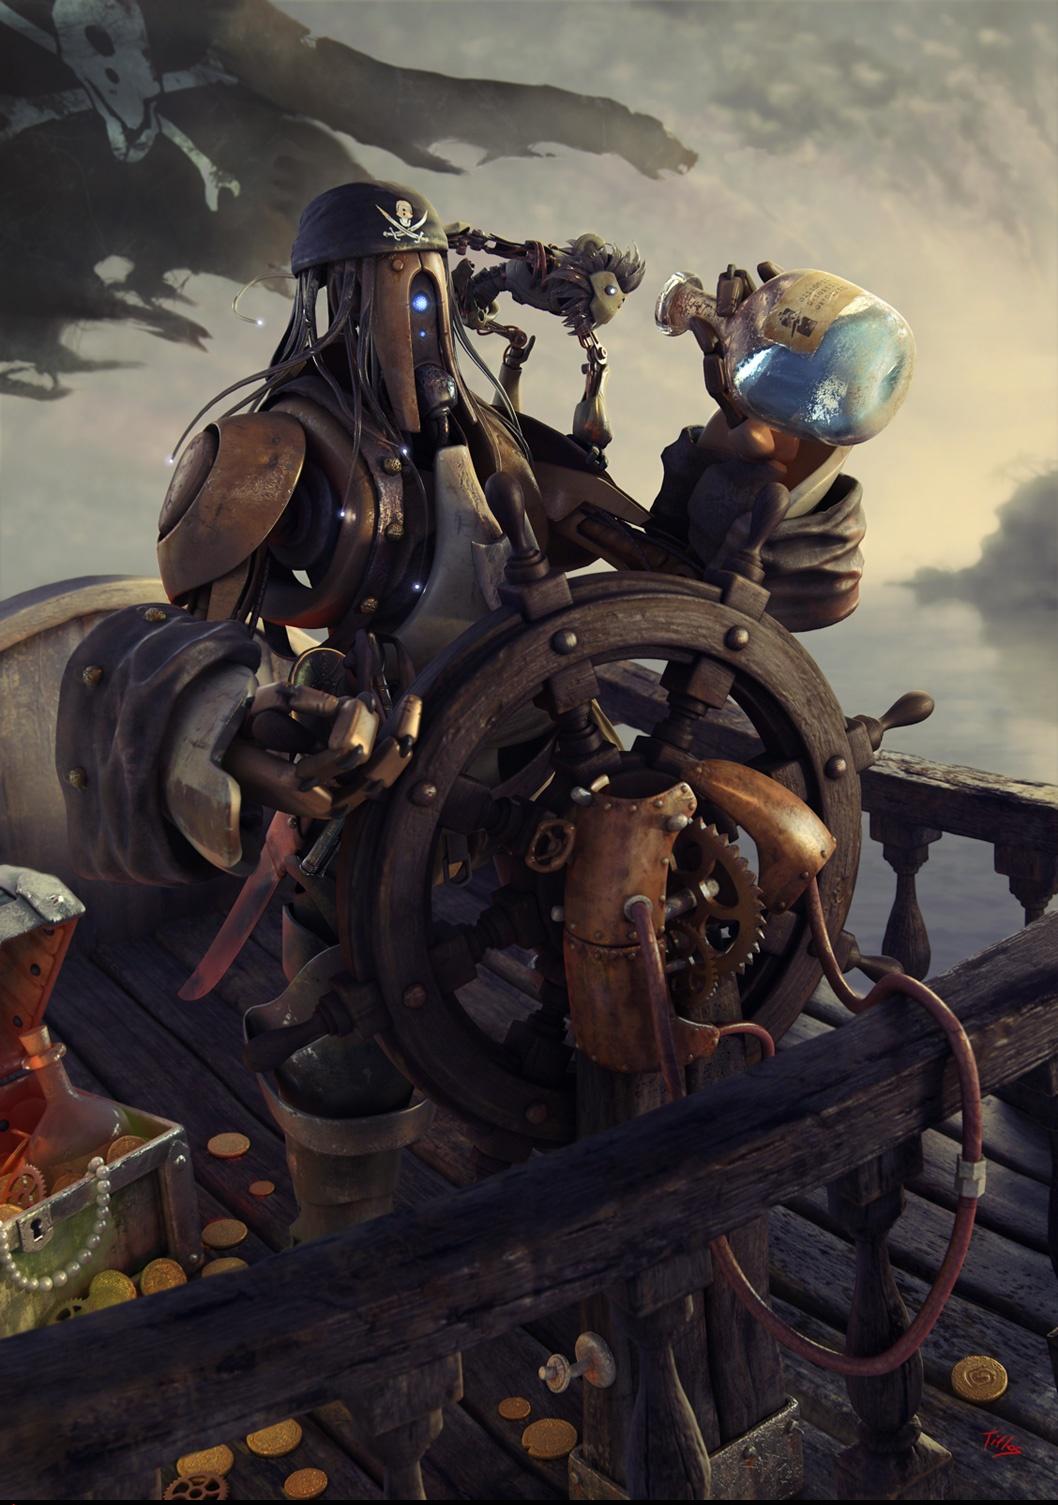 Pirate Robot by Angel Gabriel Diaz Romero